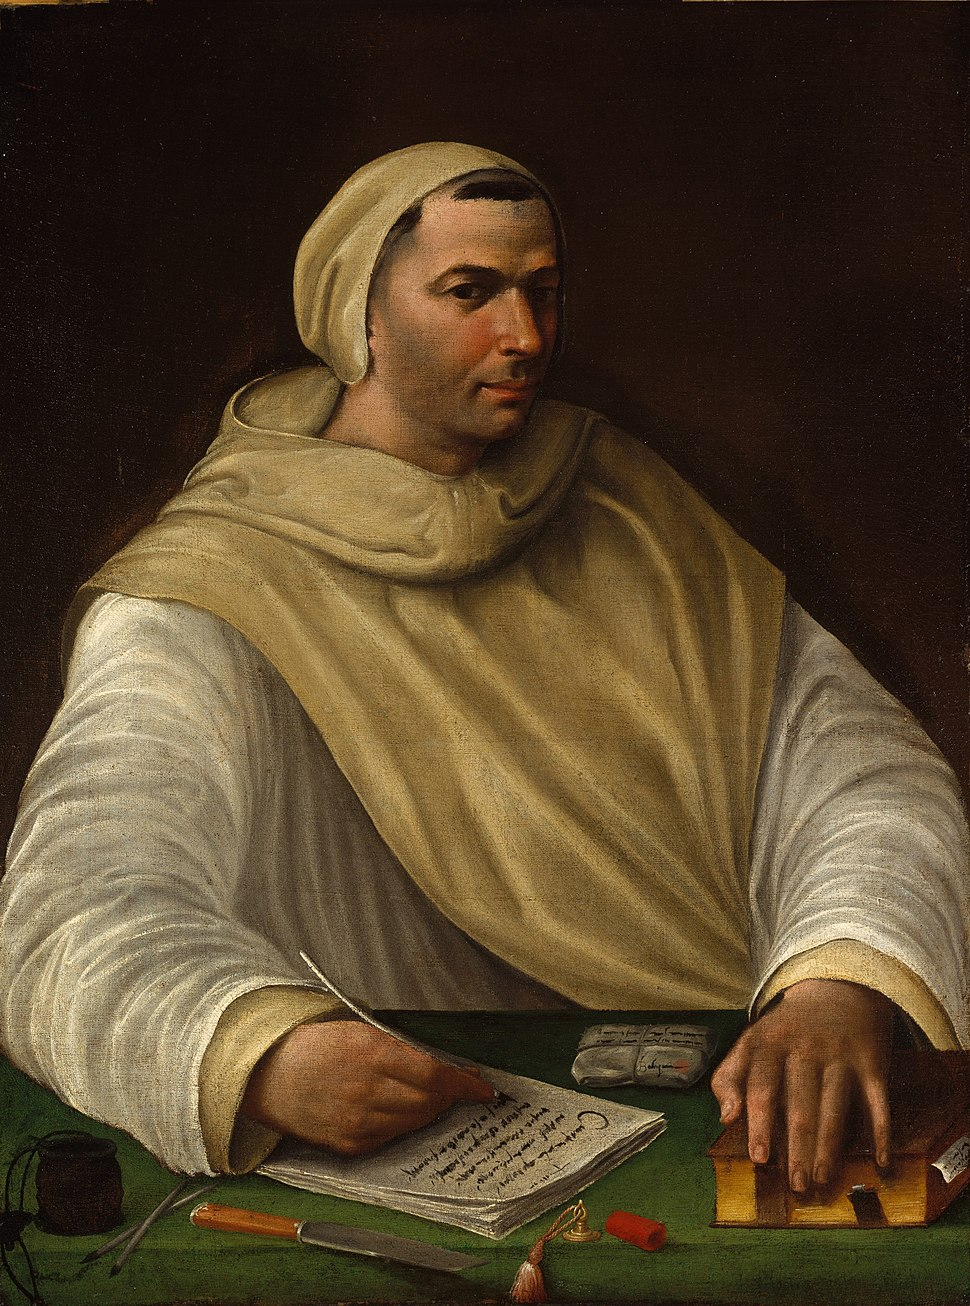 Portrait of an Olivetan Monk - Battista Franco (attributed)